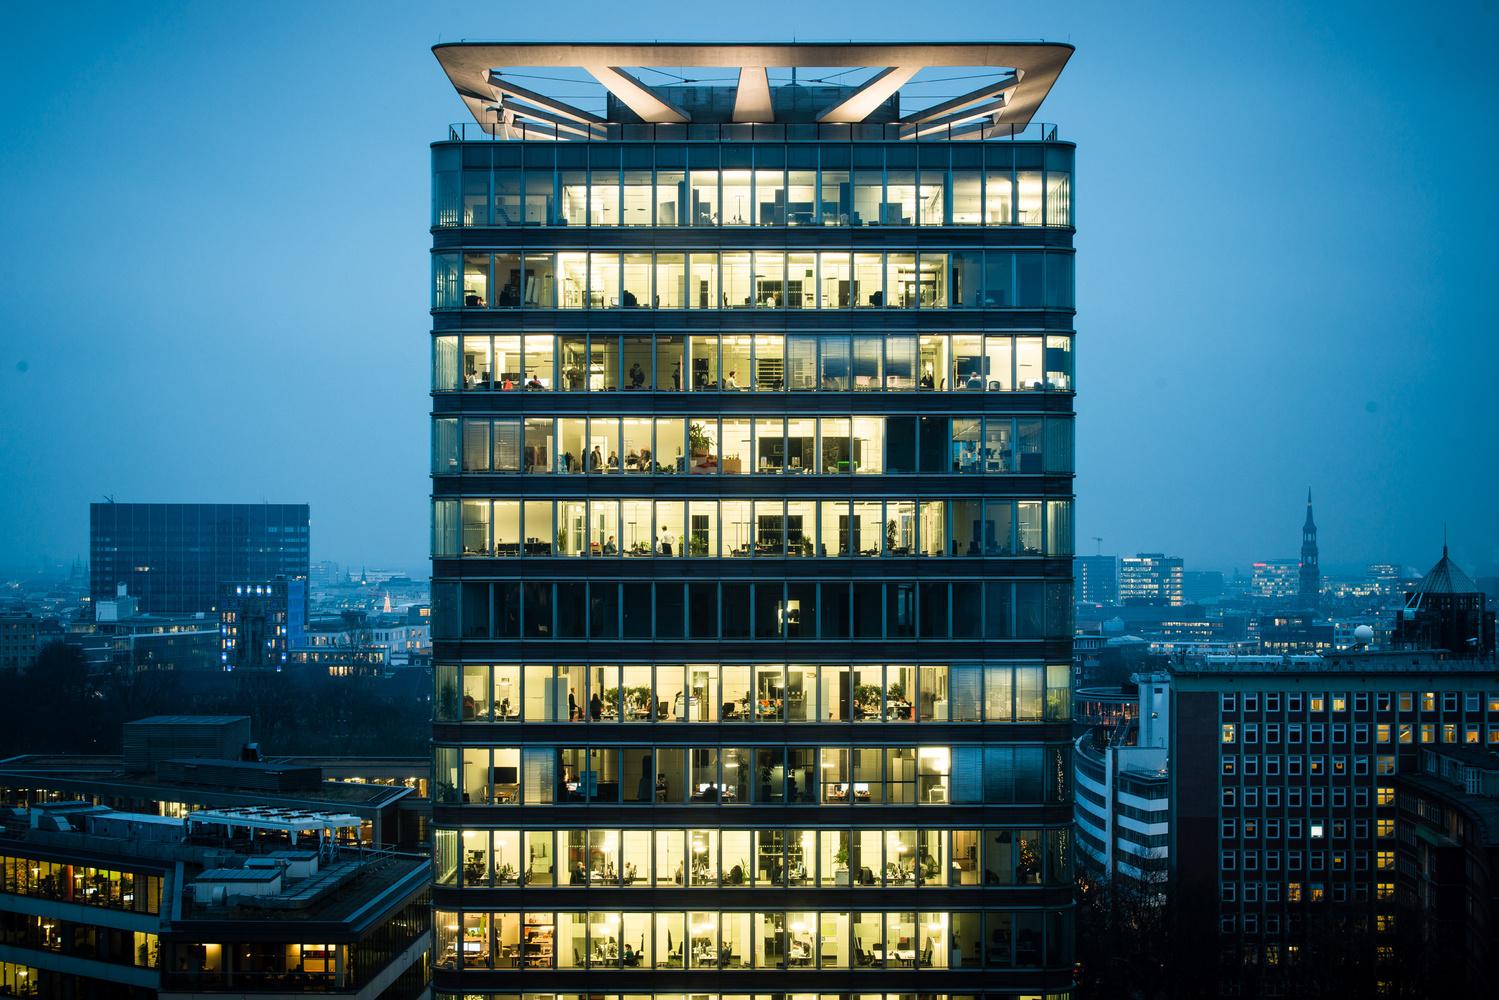 Hamburg building by Philip Erpenbeck